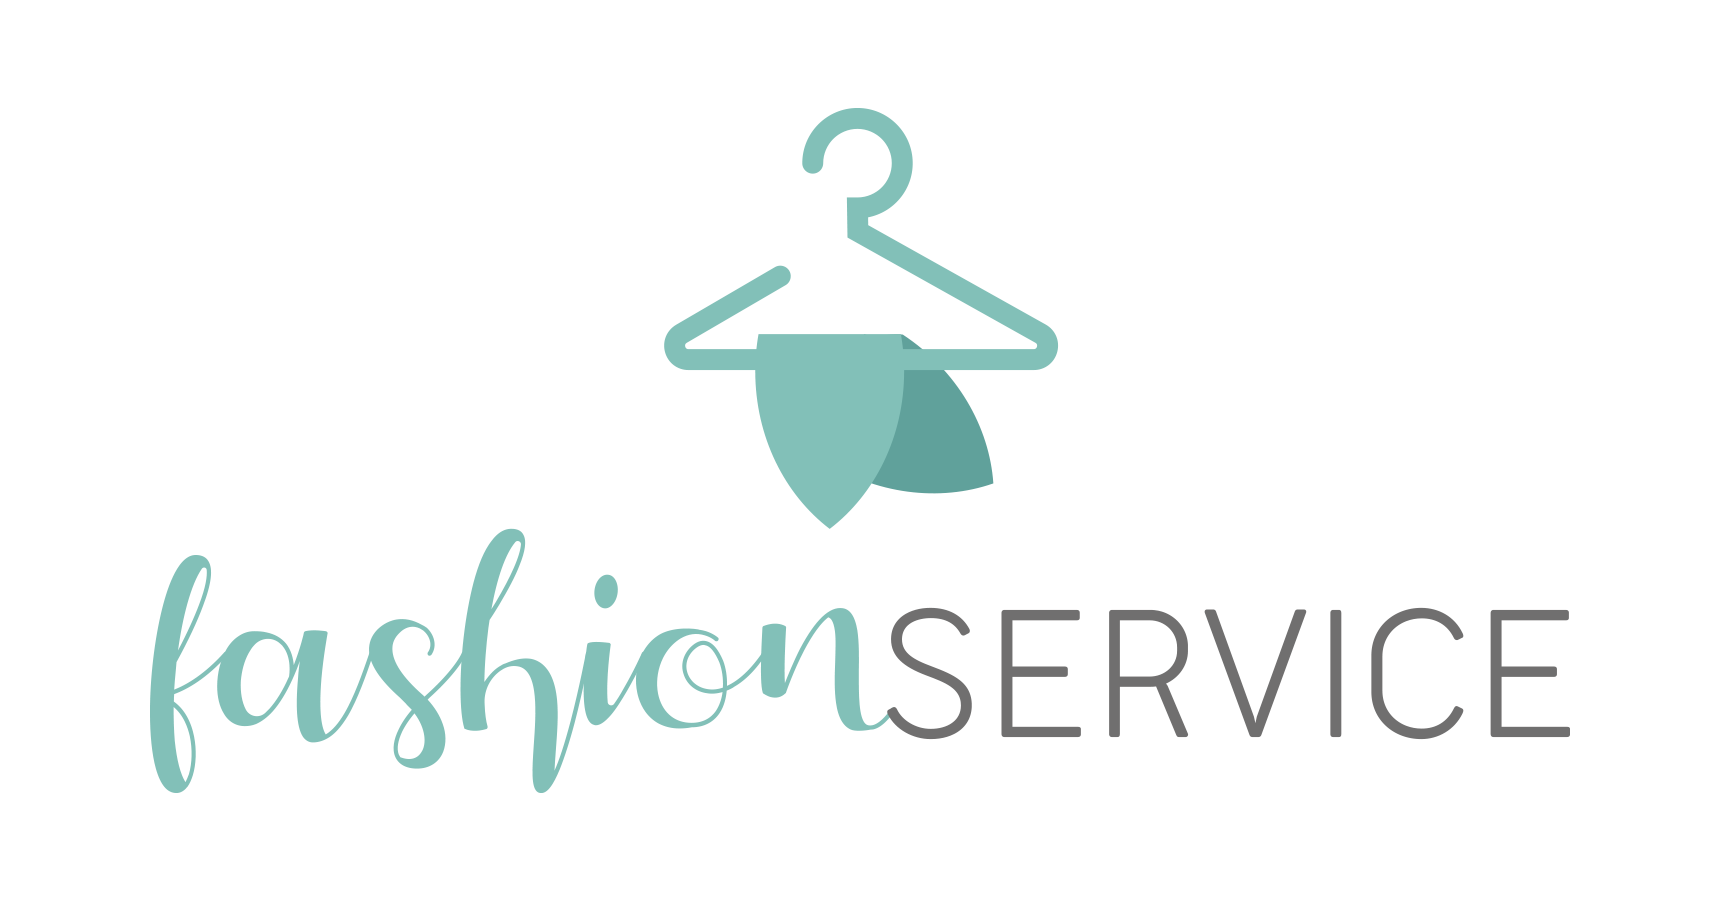 Fashion Service